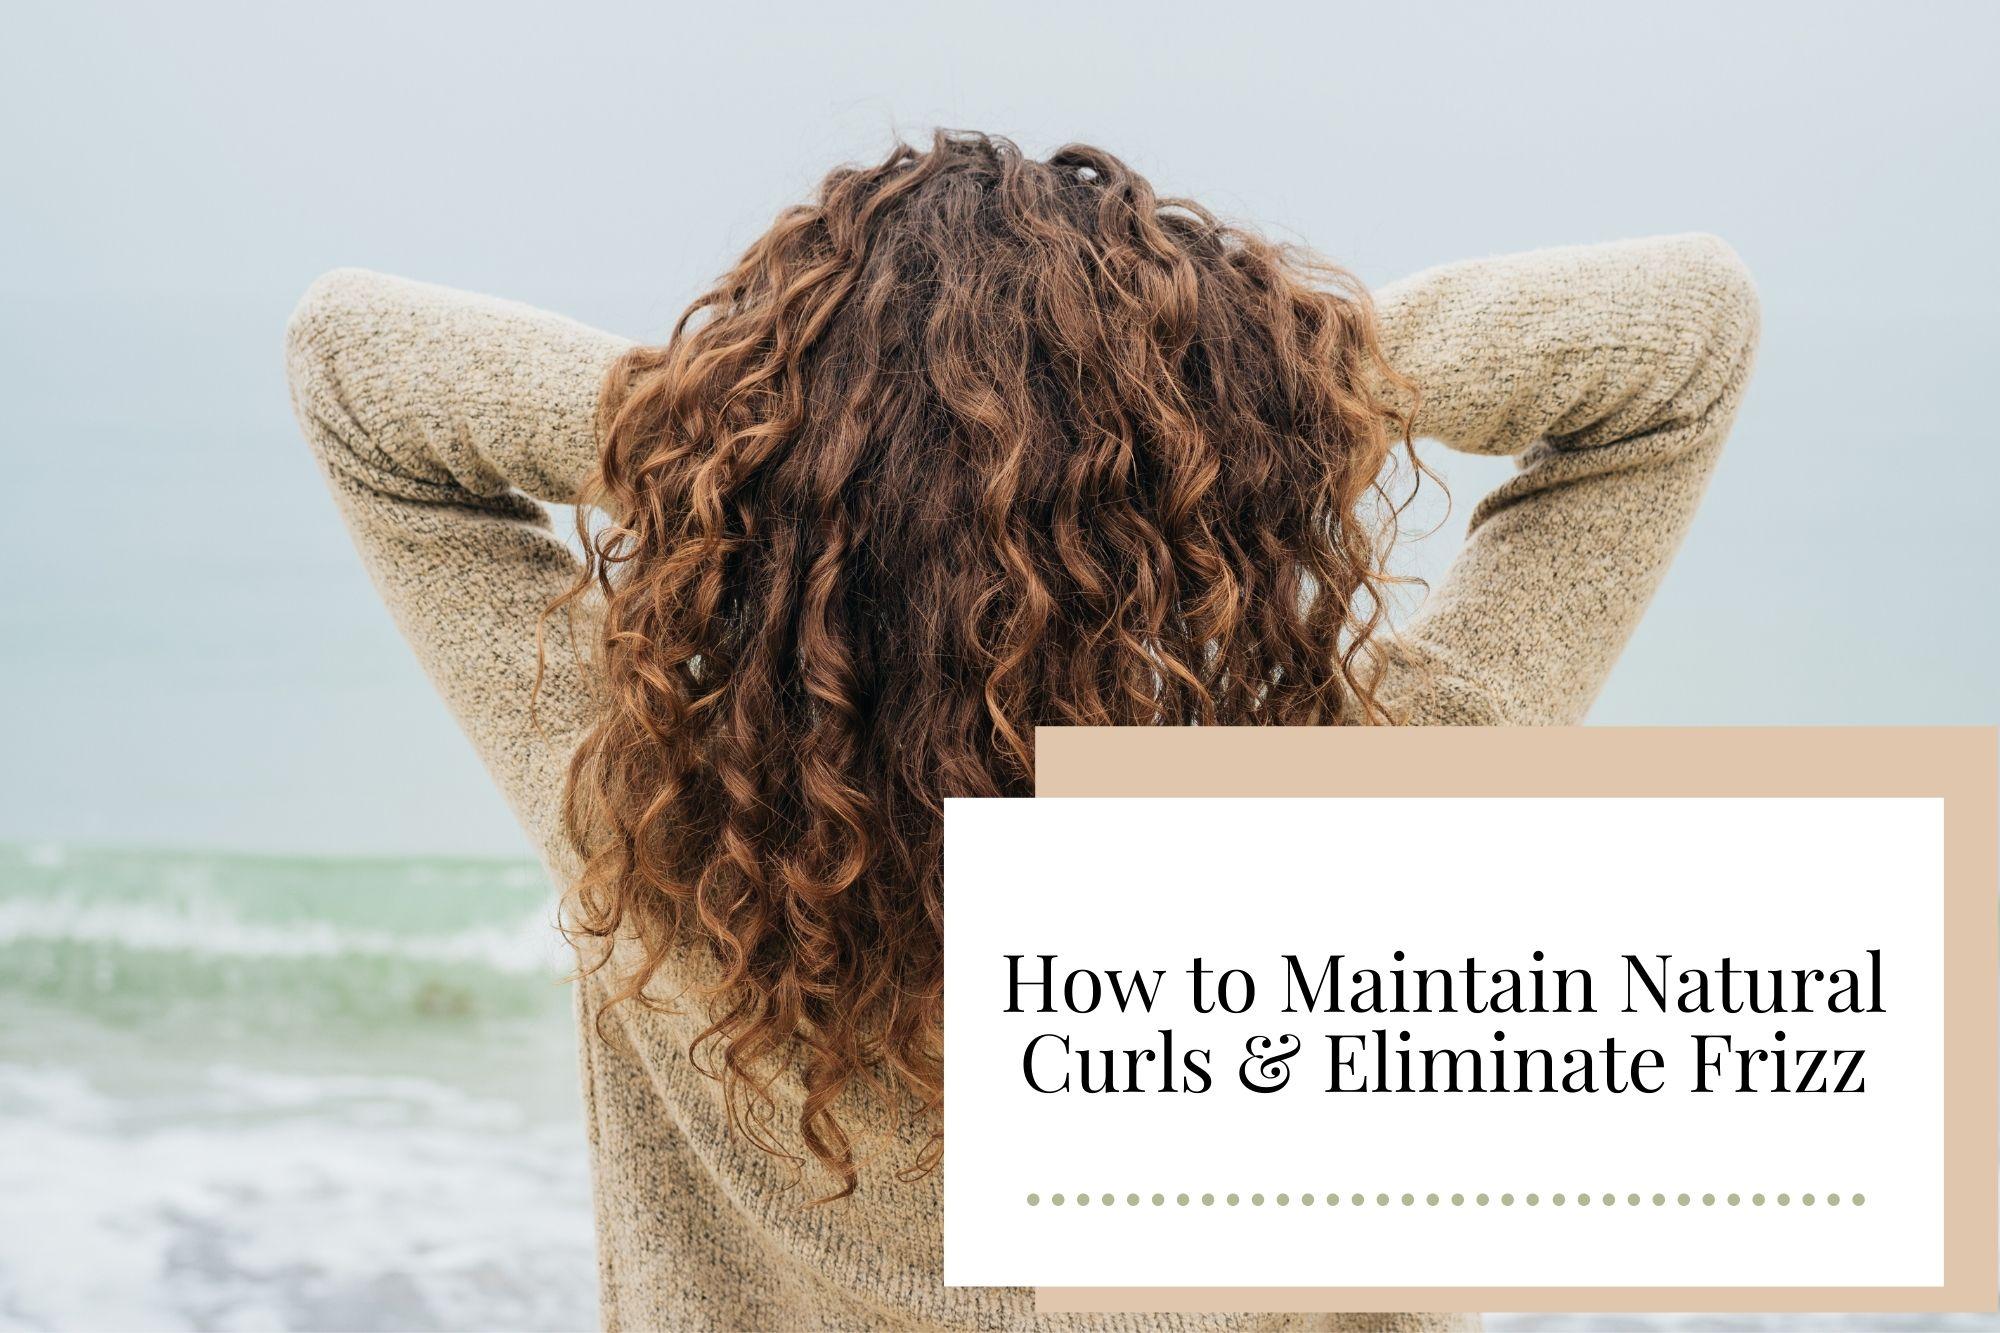 How to Maintain Natural Curls & Eliminate Frizz - Newcastle Hair Salon - Blanc Hair Studio